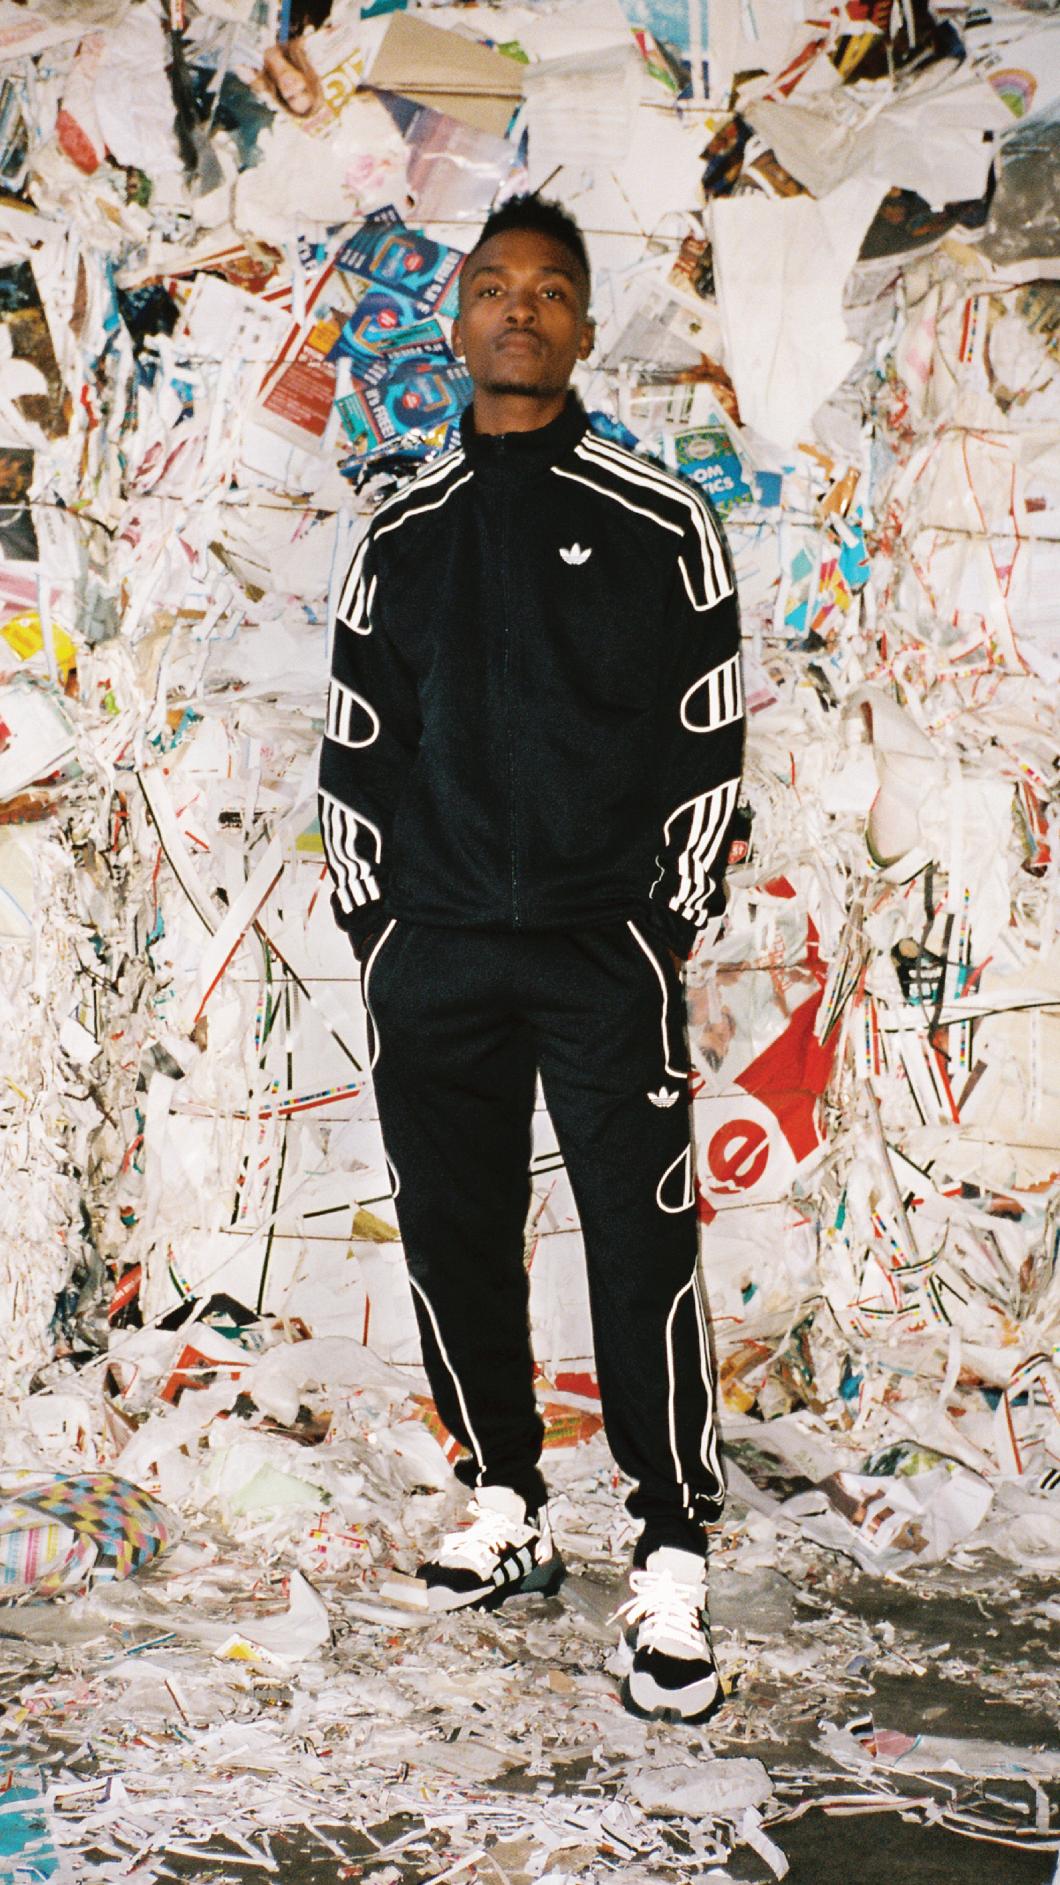 DJ LAG in the Adidas Nite Jogger Sneakers